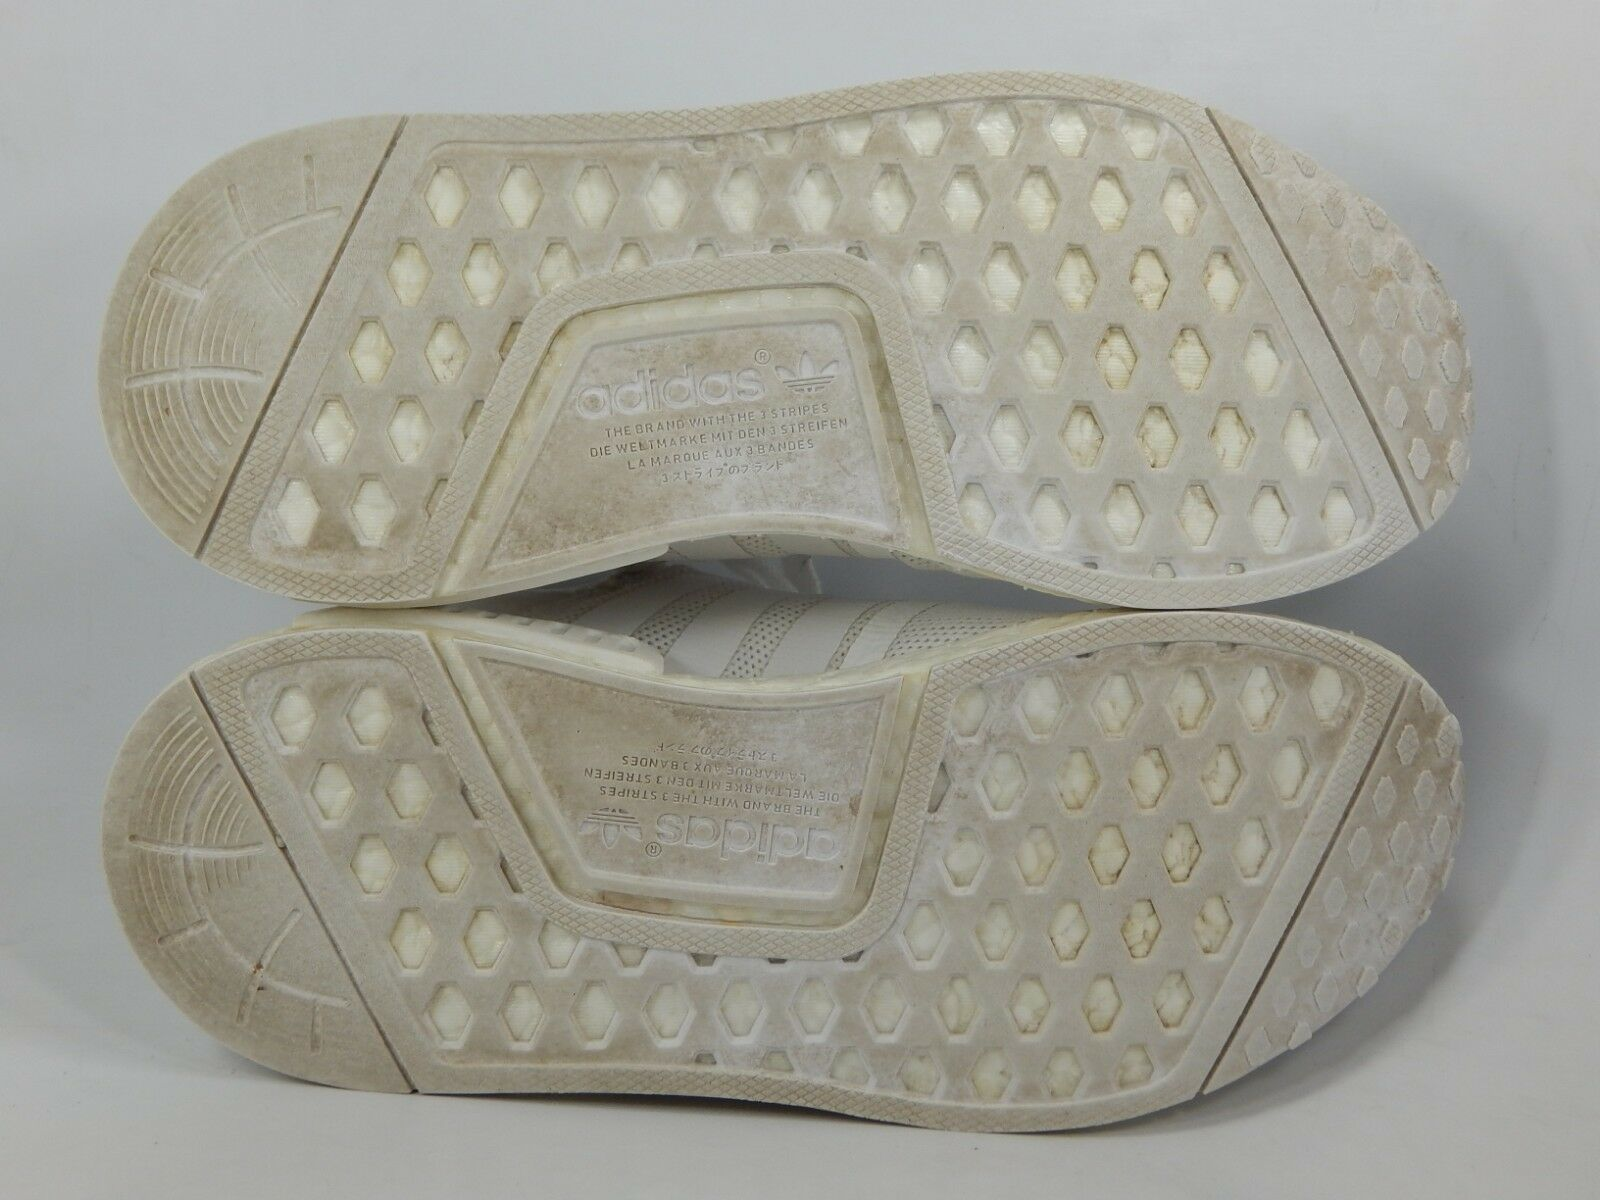 Adidas Nmd R1 Triplo Bianca Taglia 5 M (Y) Eu 37 1/3 Giovanile Scarpe da Corsa